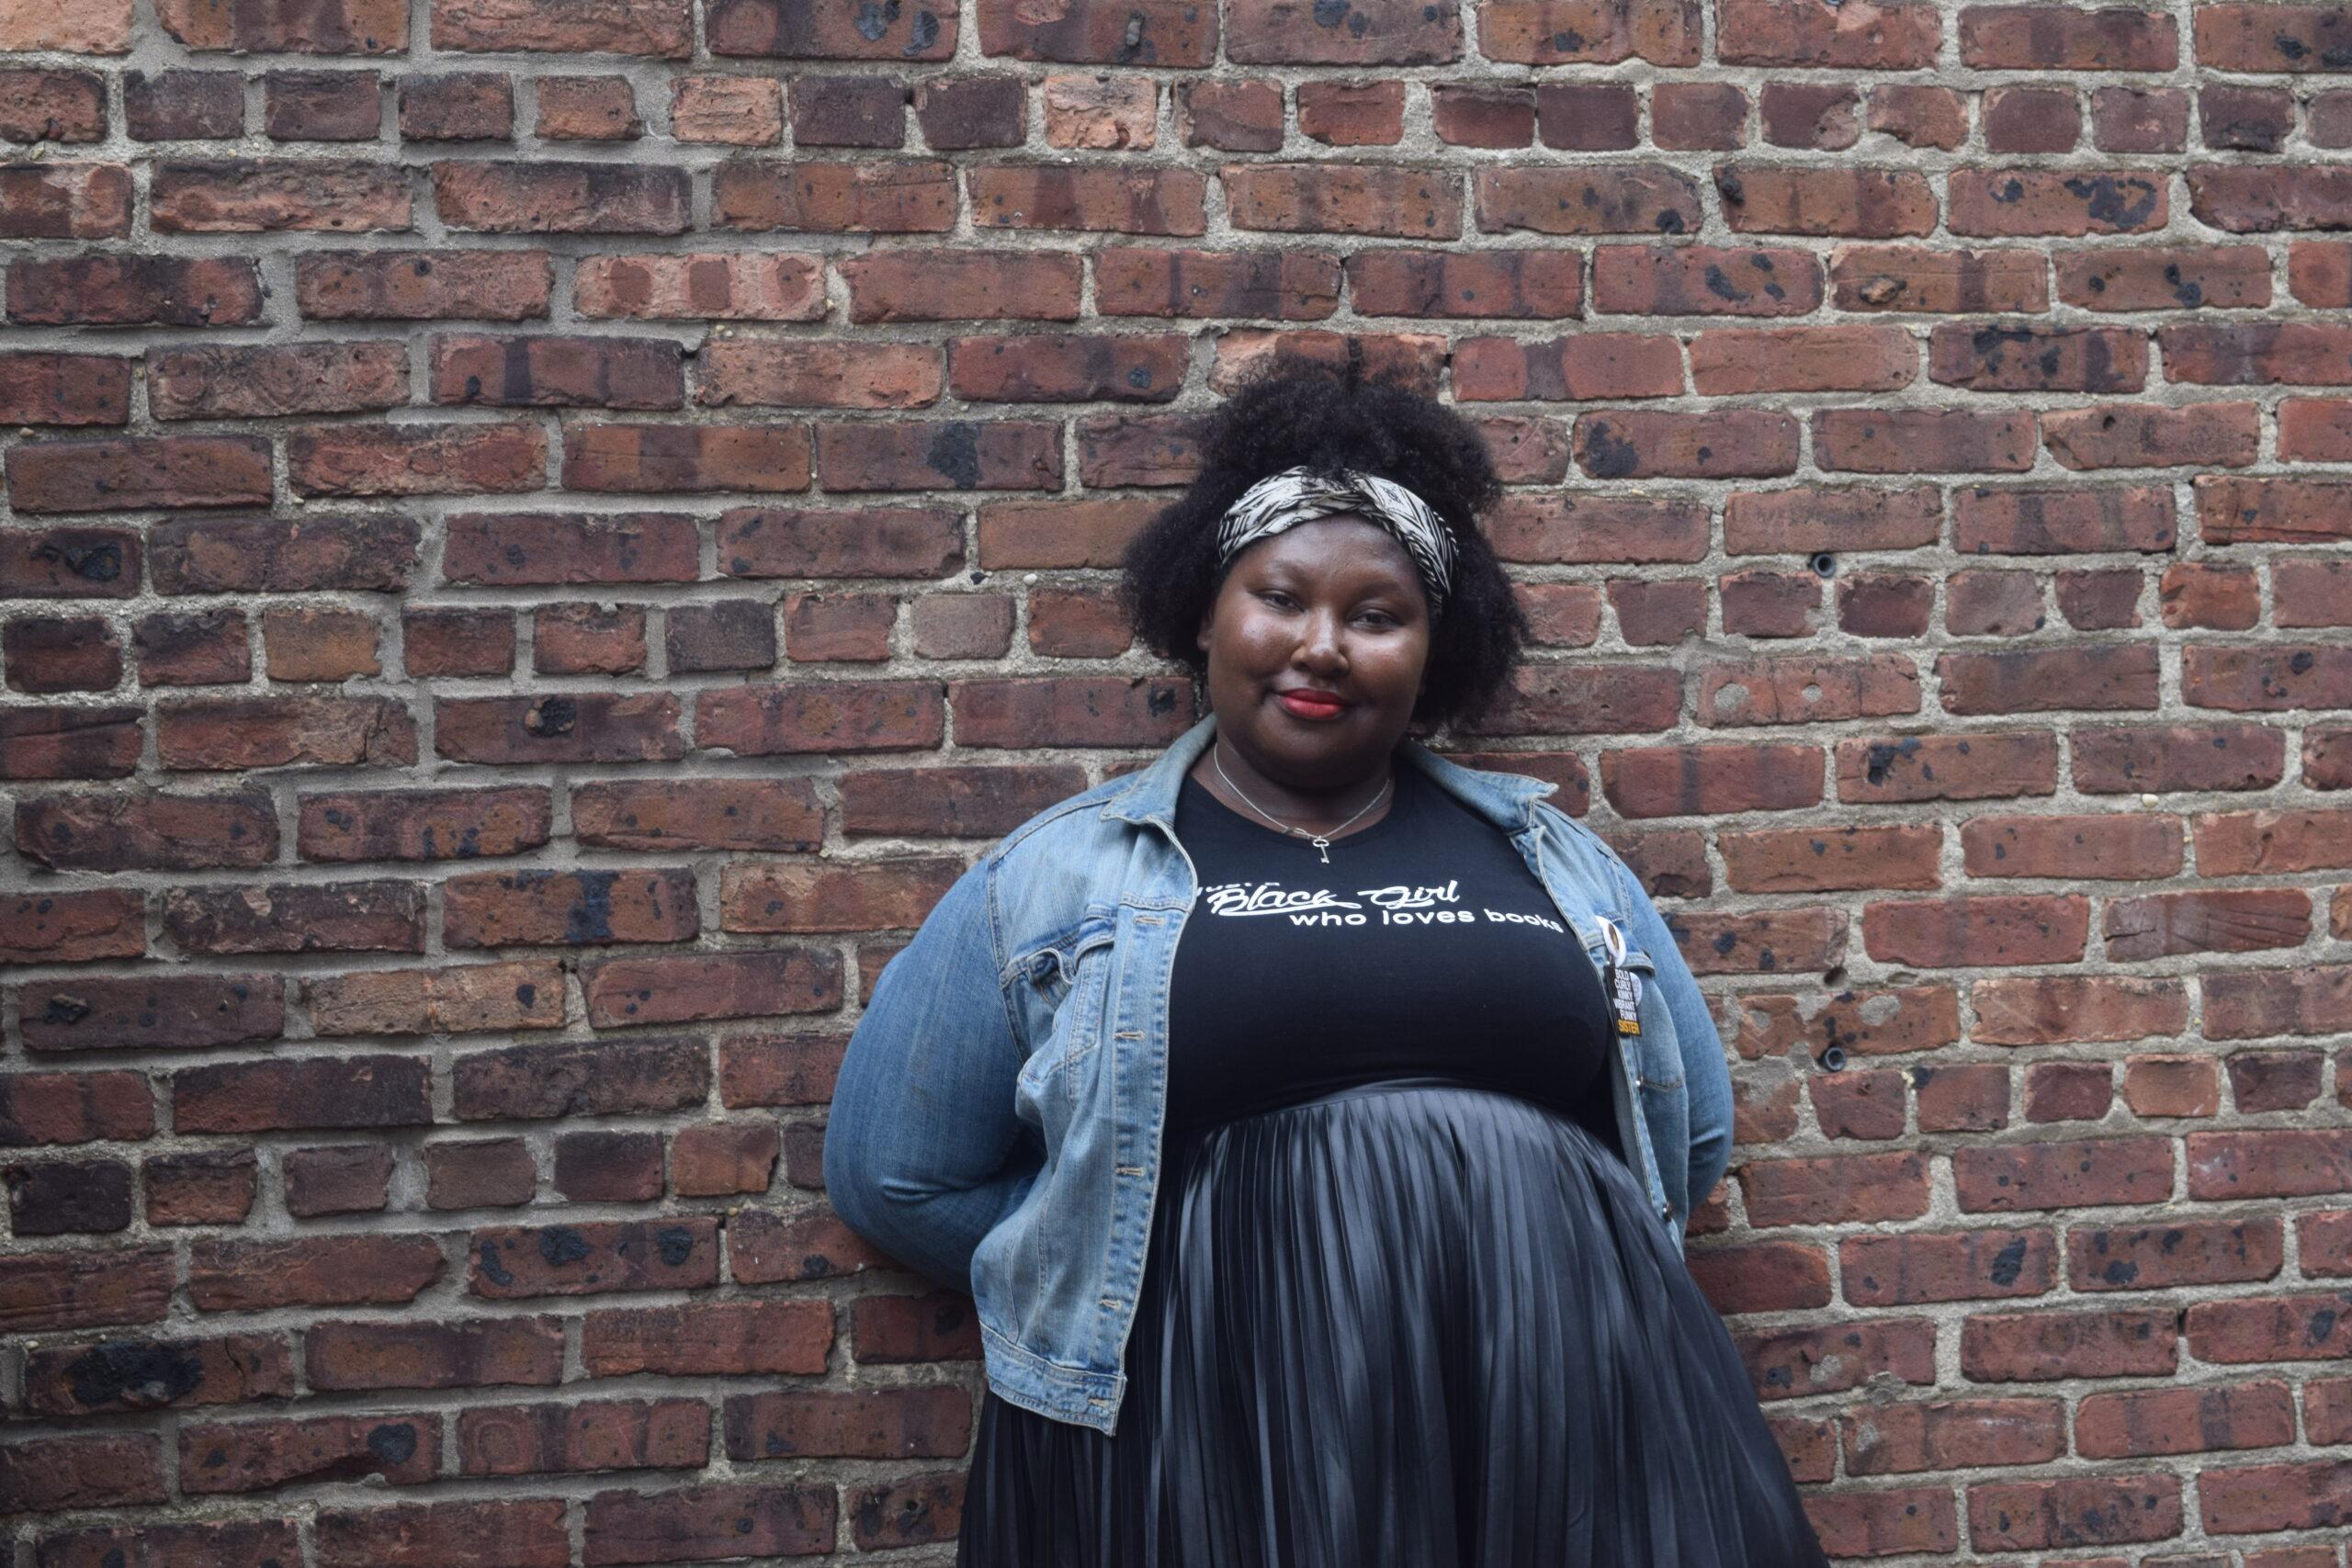 Keyaira Boone @pennedbykeyaira